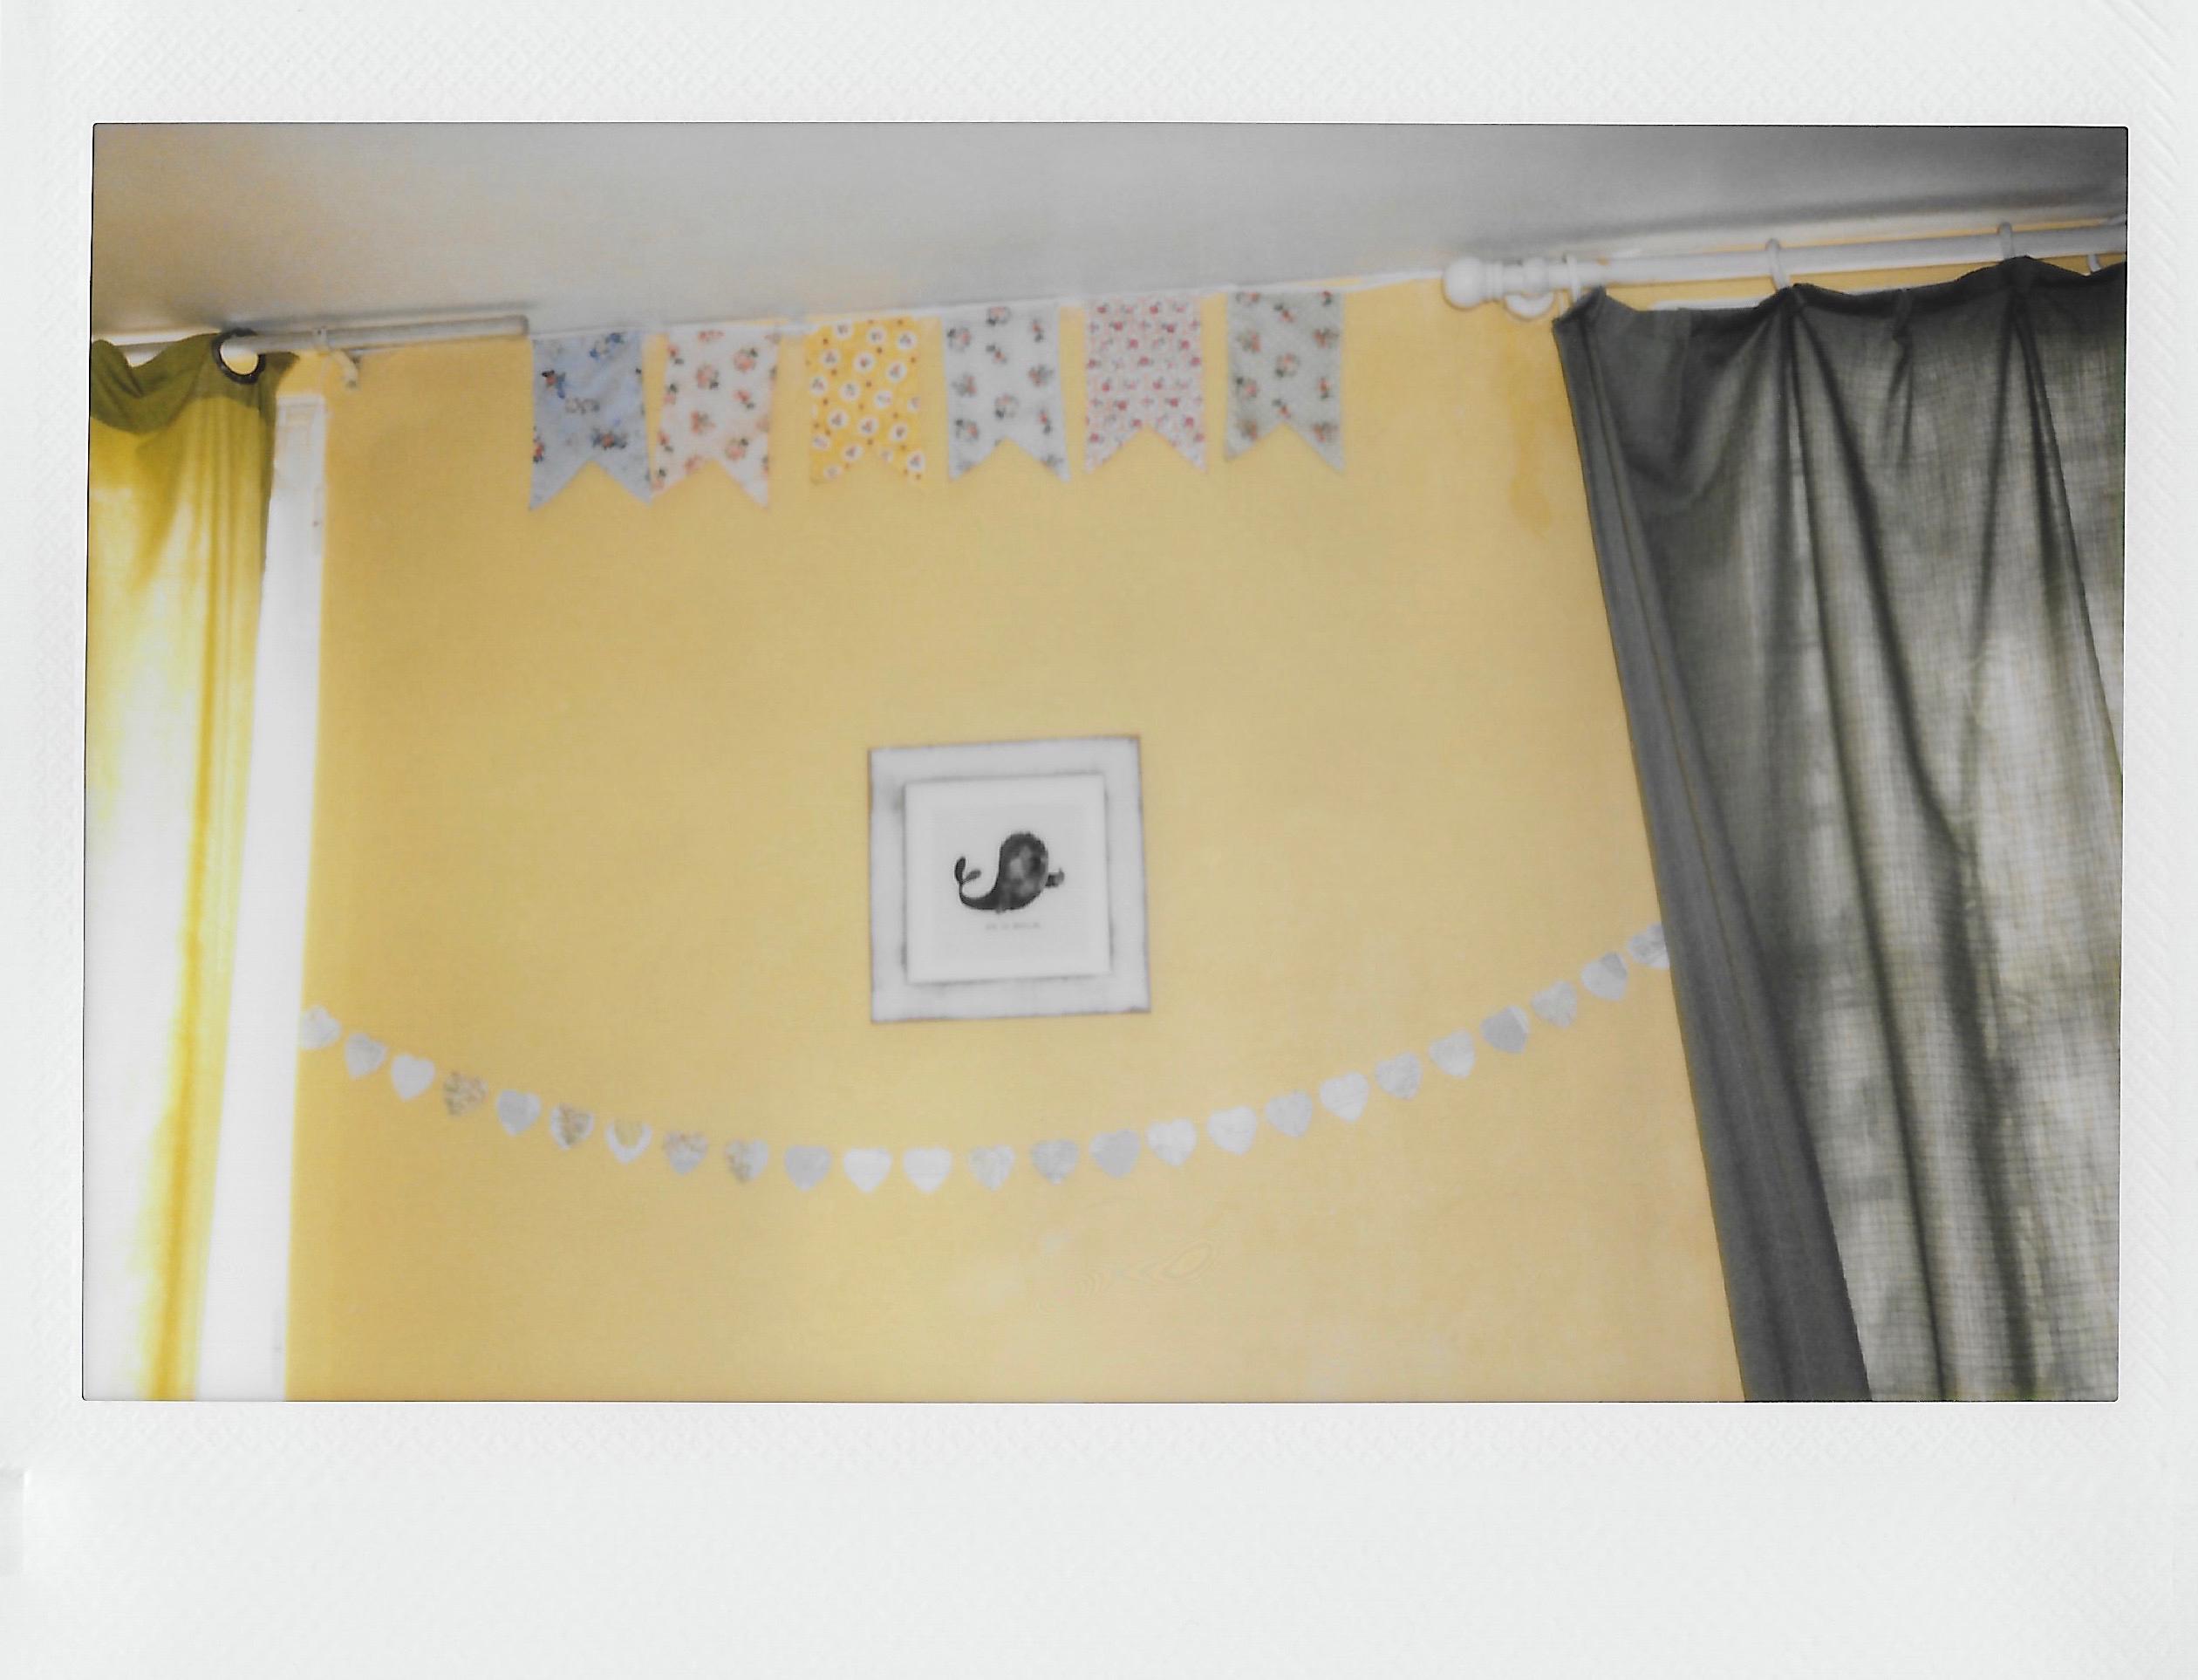 lace & lilacs: a paris-based lifestyle blogabby ingwersen